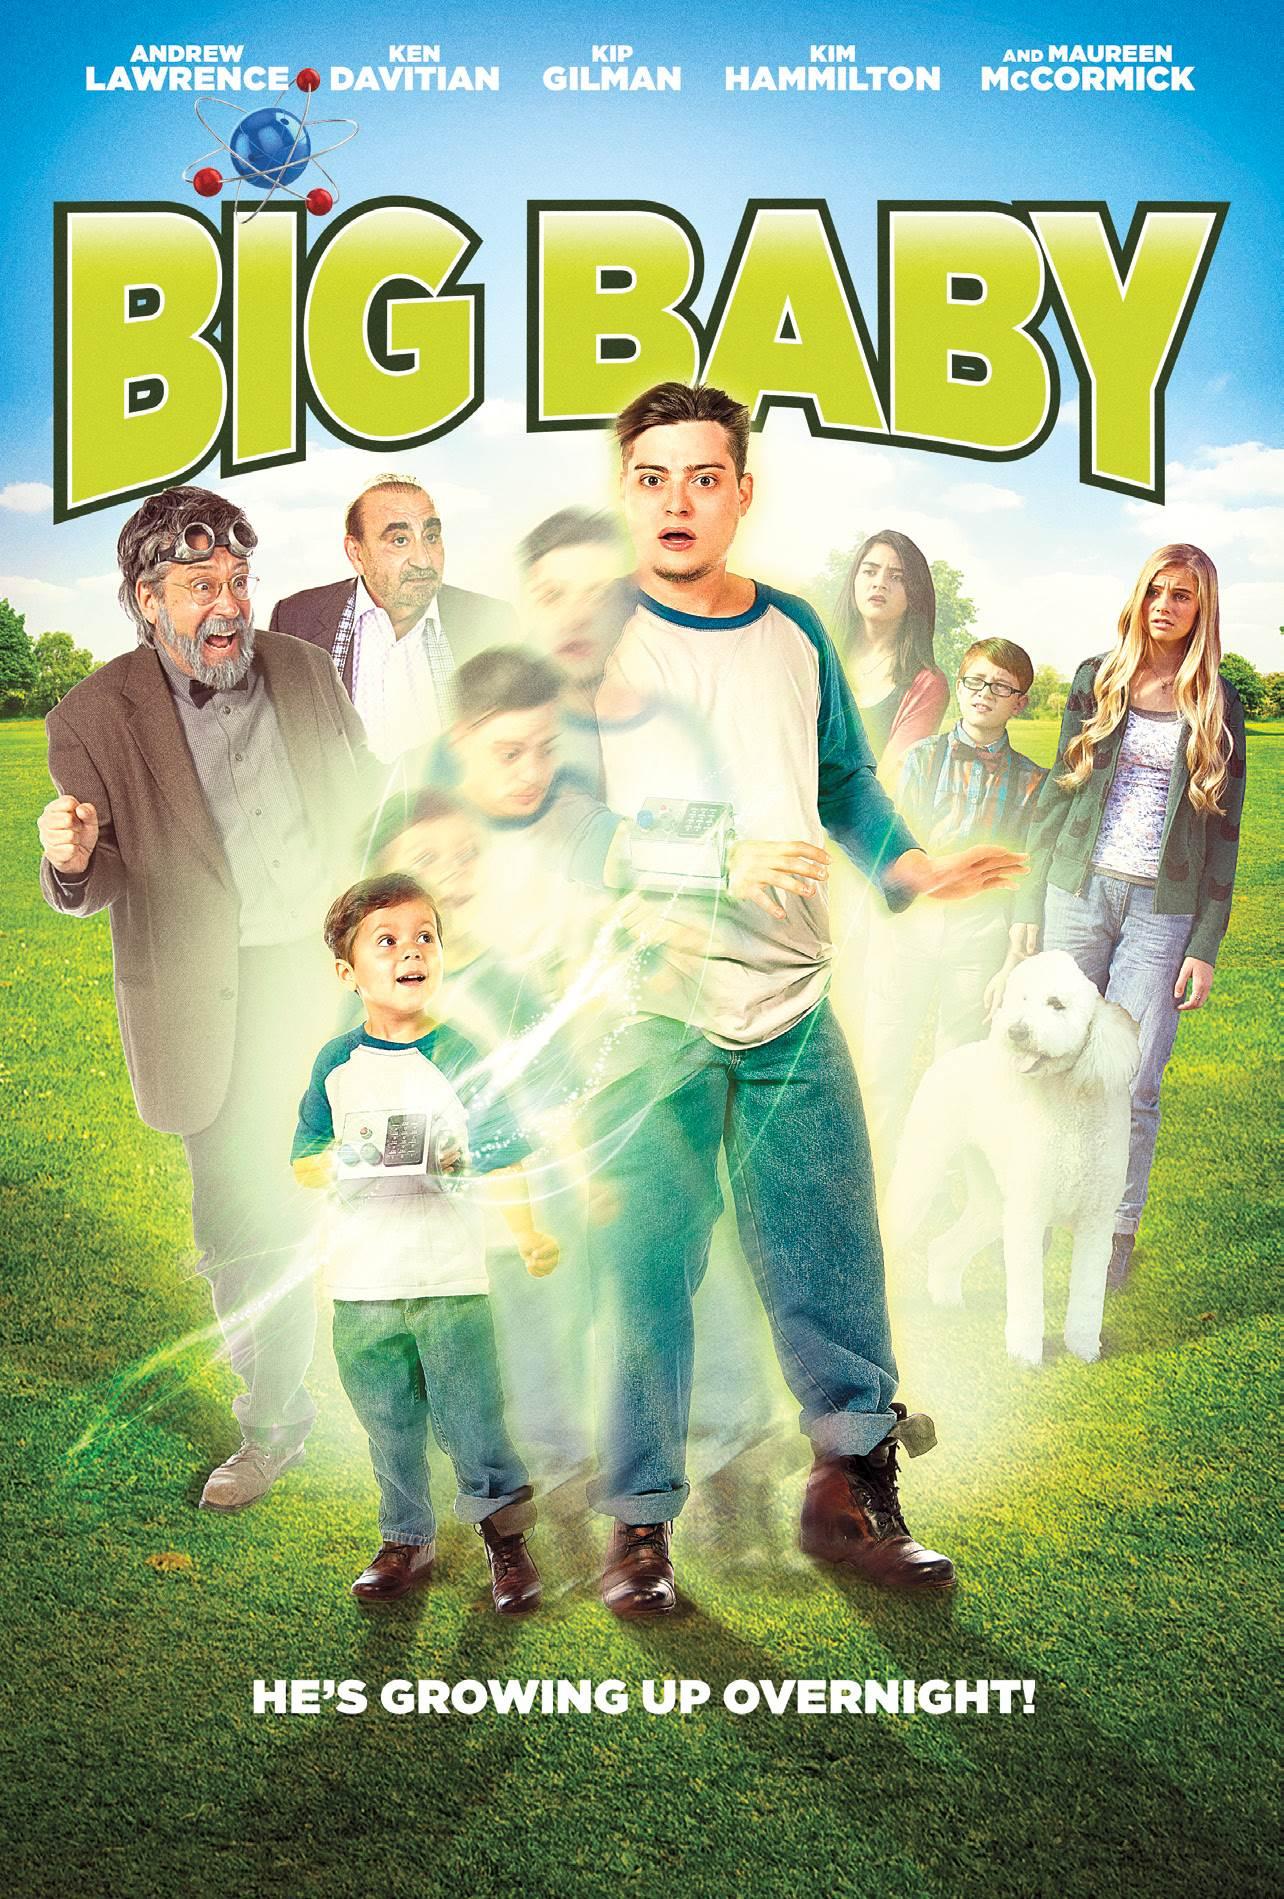 Big Baby (2015) - Stephen Langford   Related   AllMovie